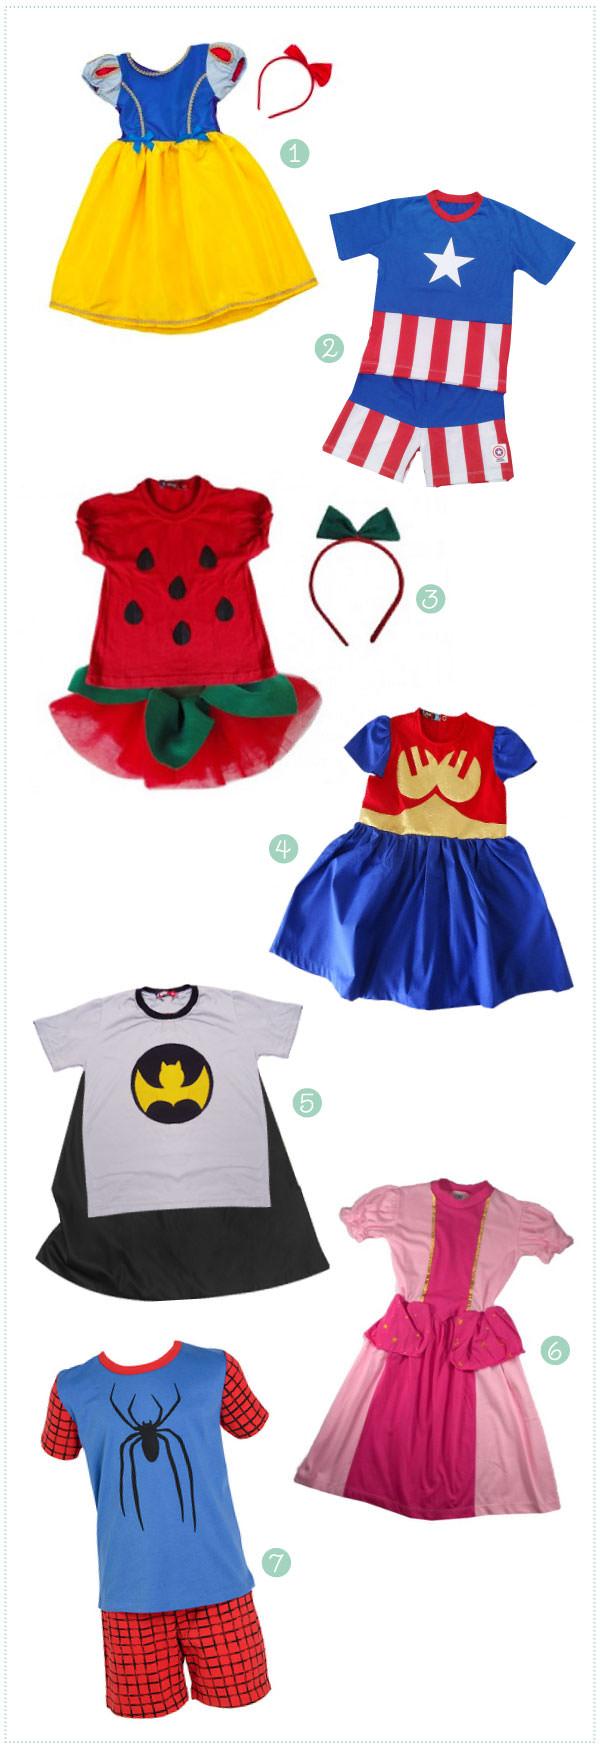 fantasias-criancas-carnaval-princesas-super-heroi